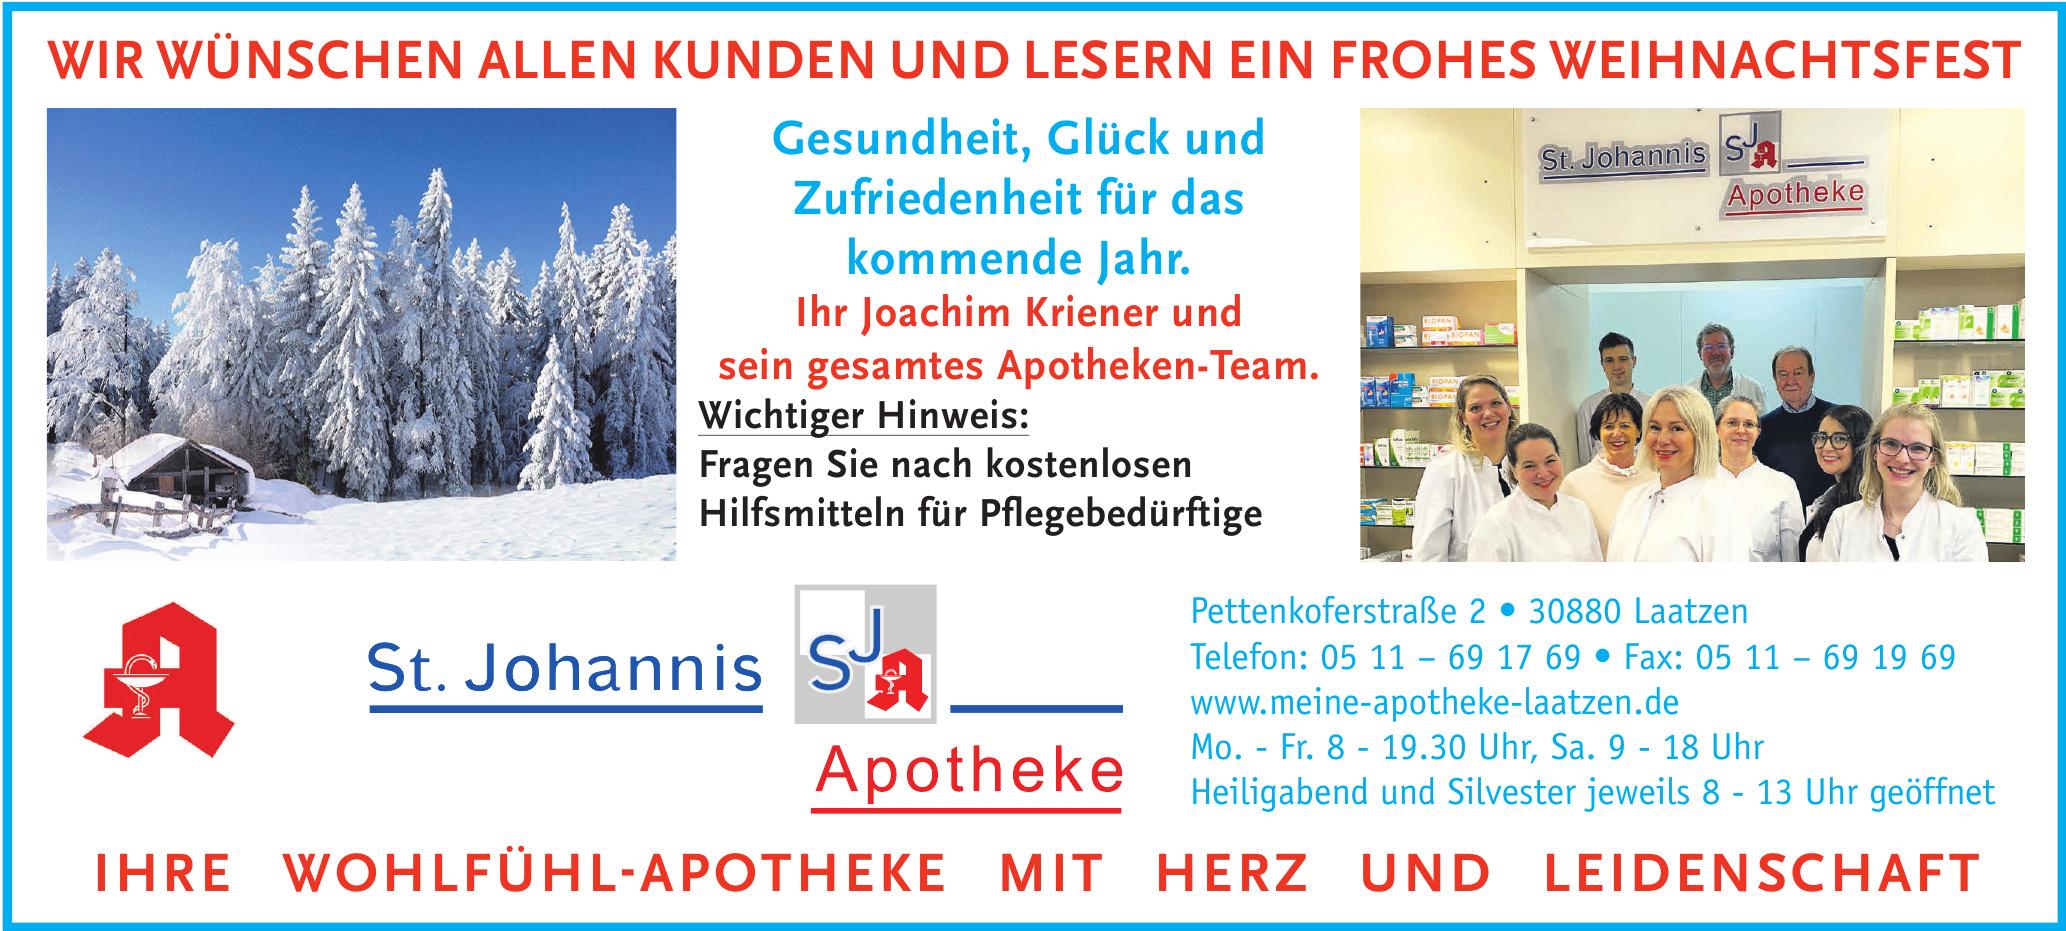 St. Johannis Apotheke Laatzen